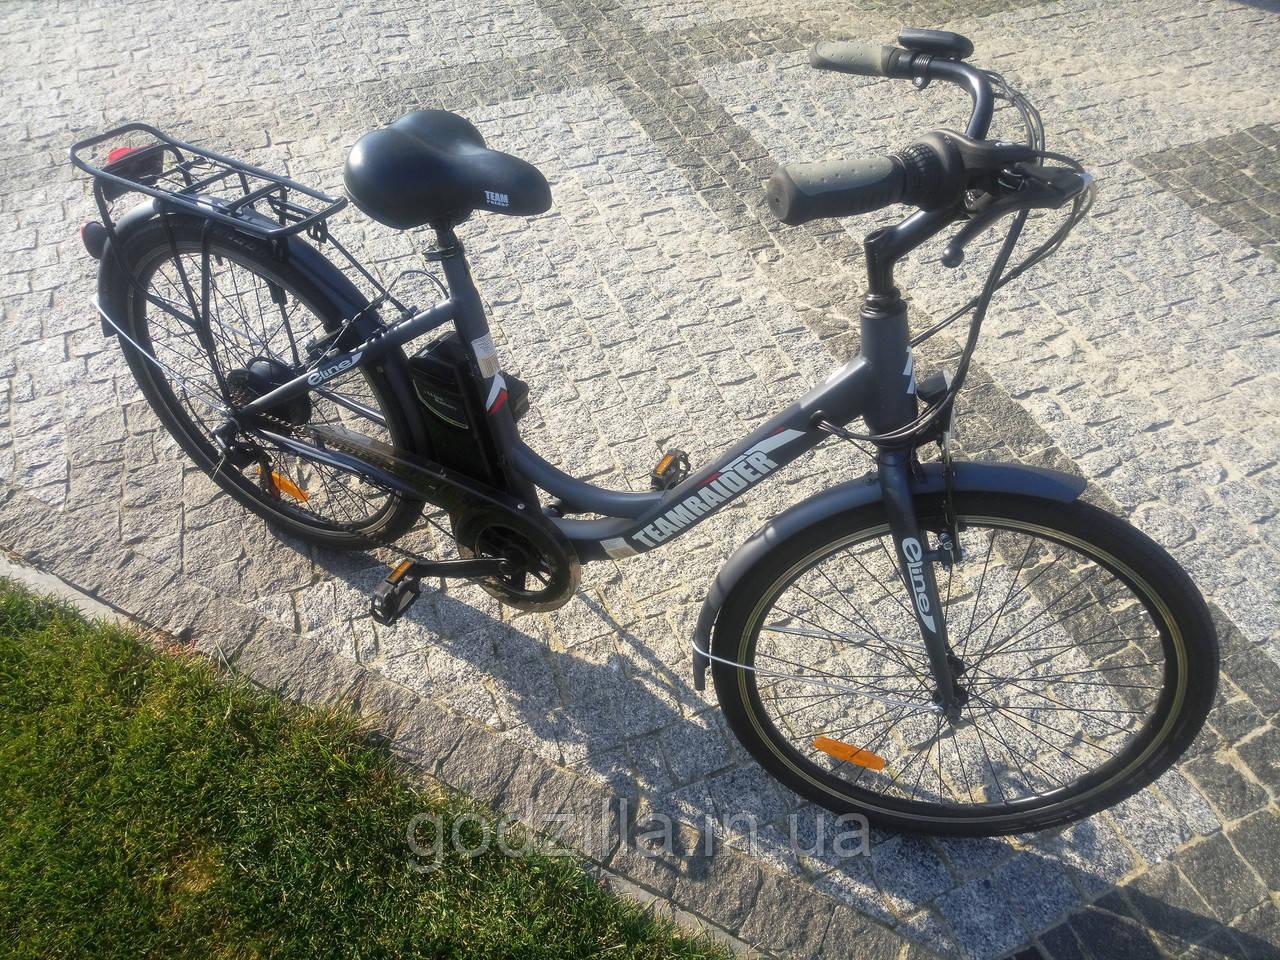 Гибридный электрический велосипед Teamraider E-line 26